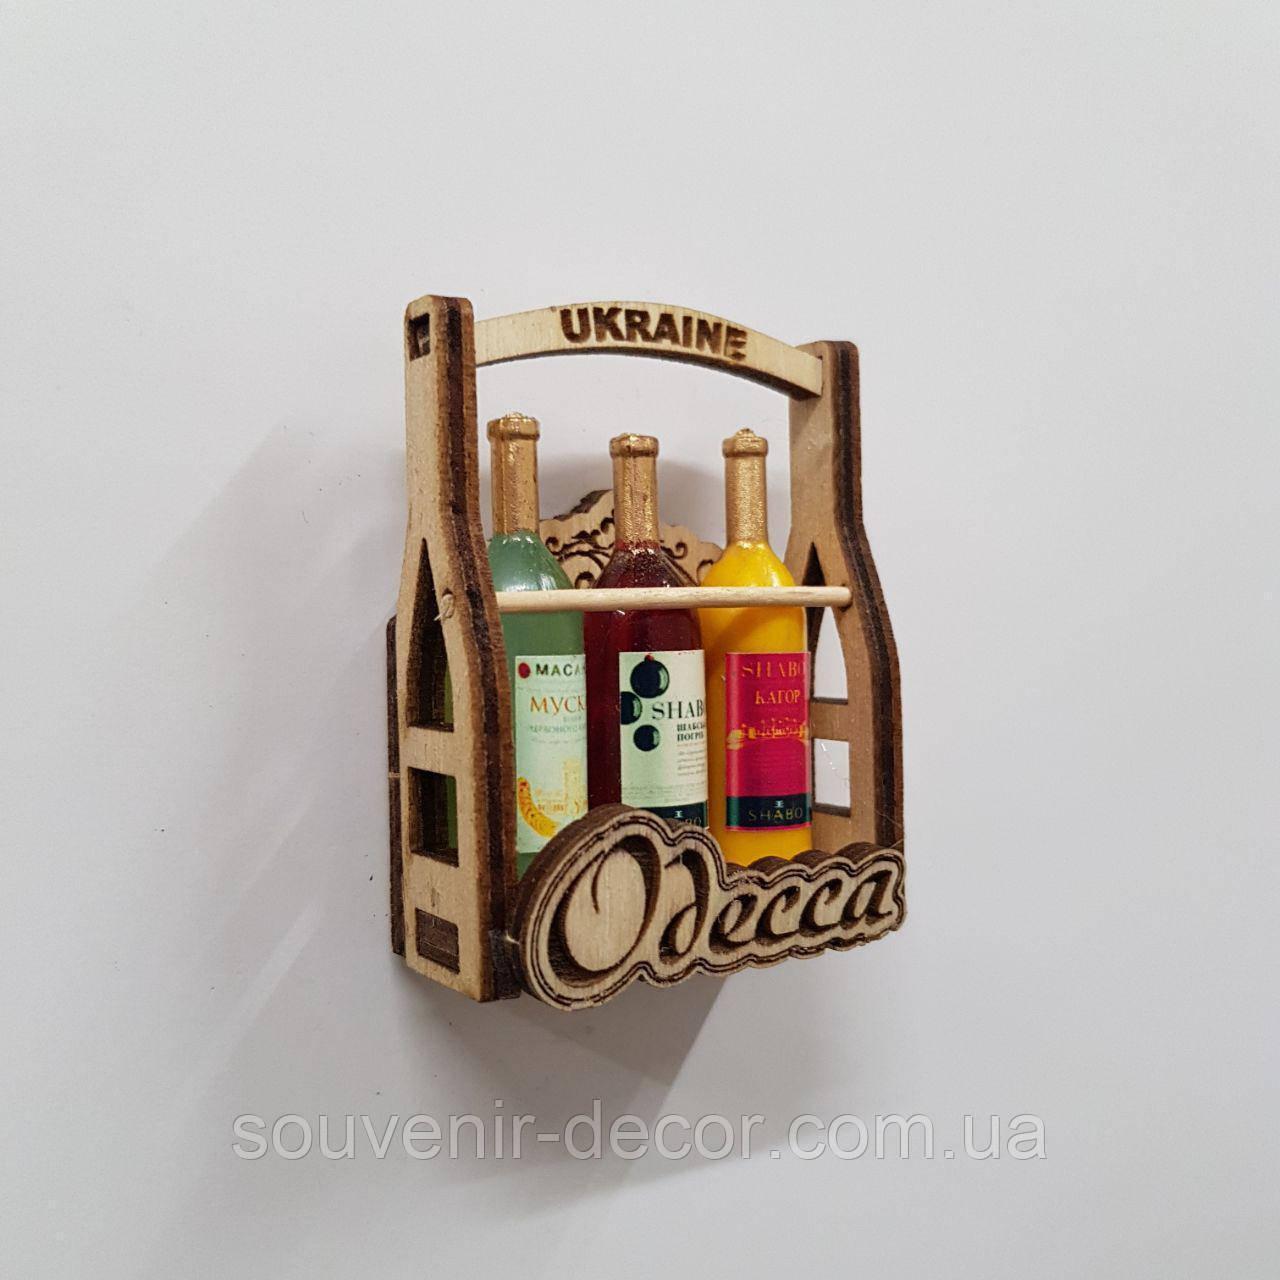 Магнит с 3 бутылками Одесса дерево